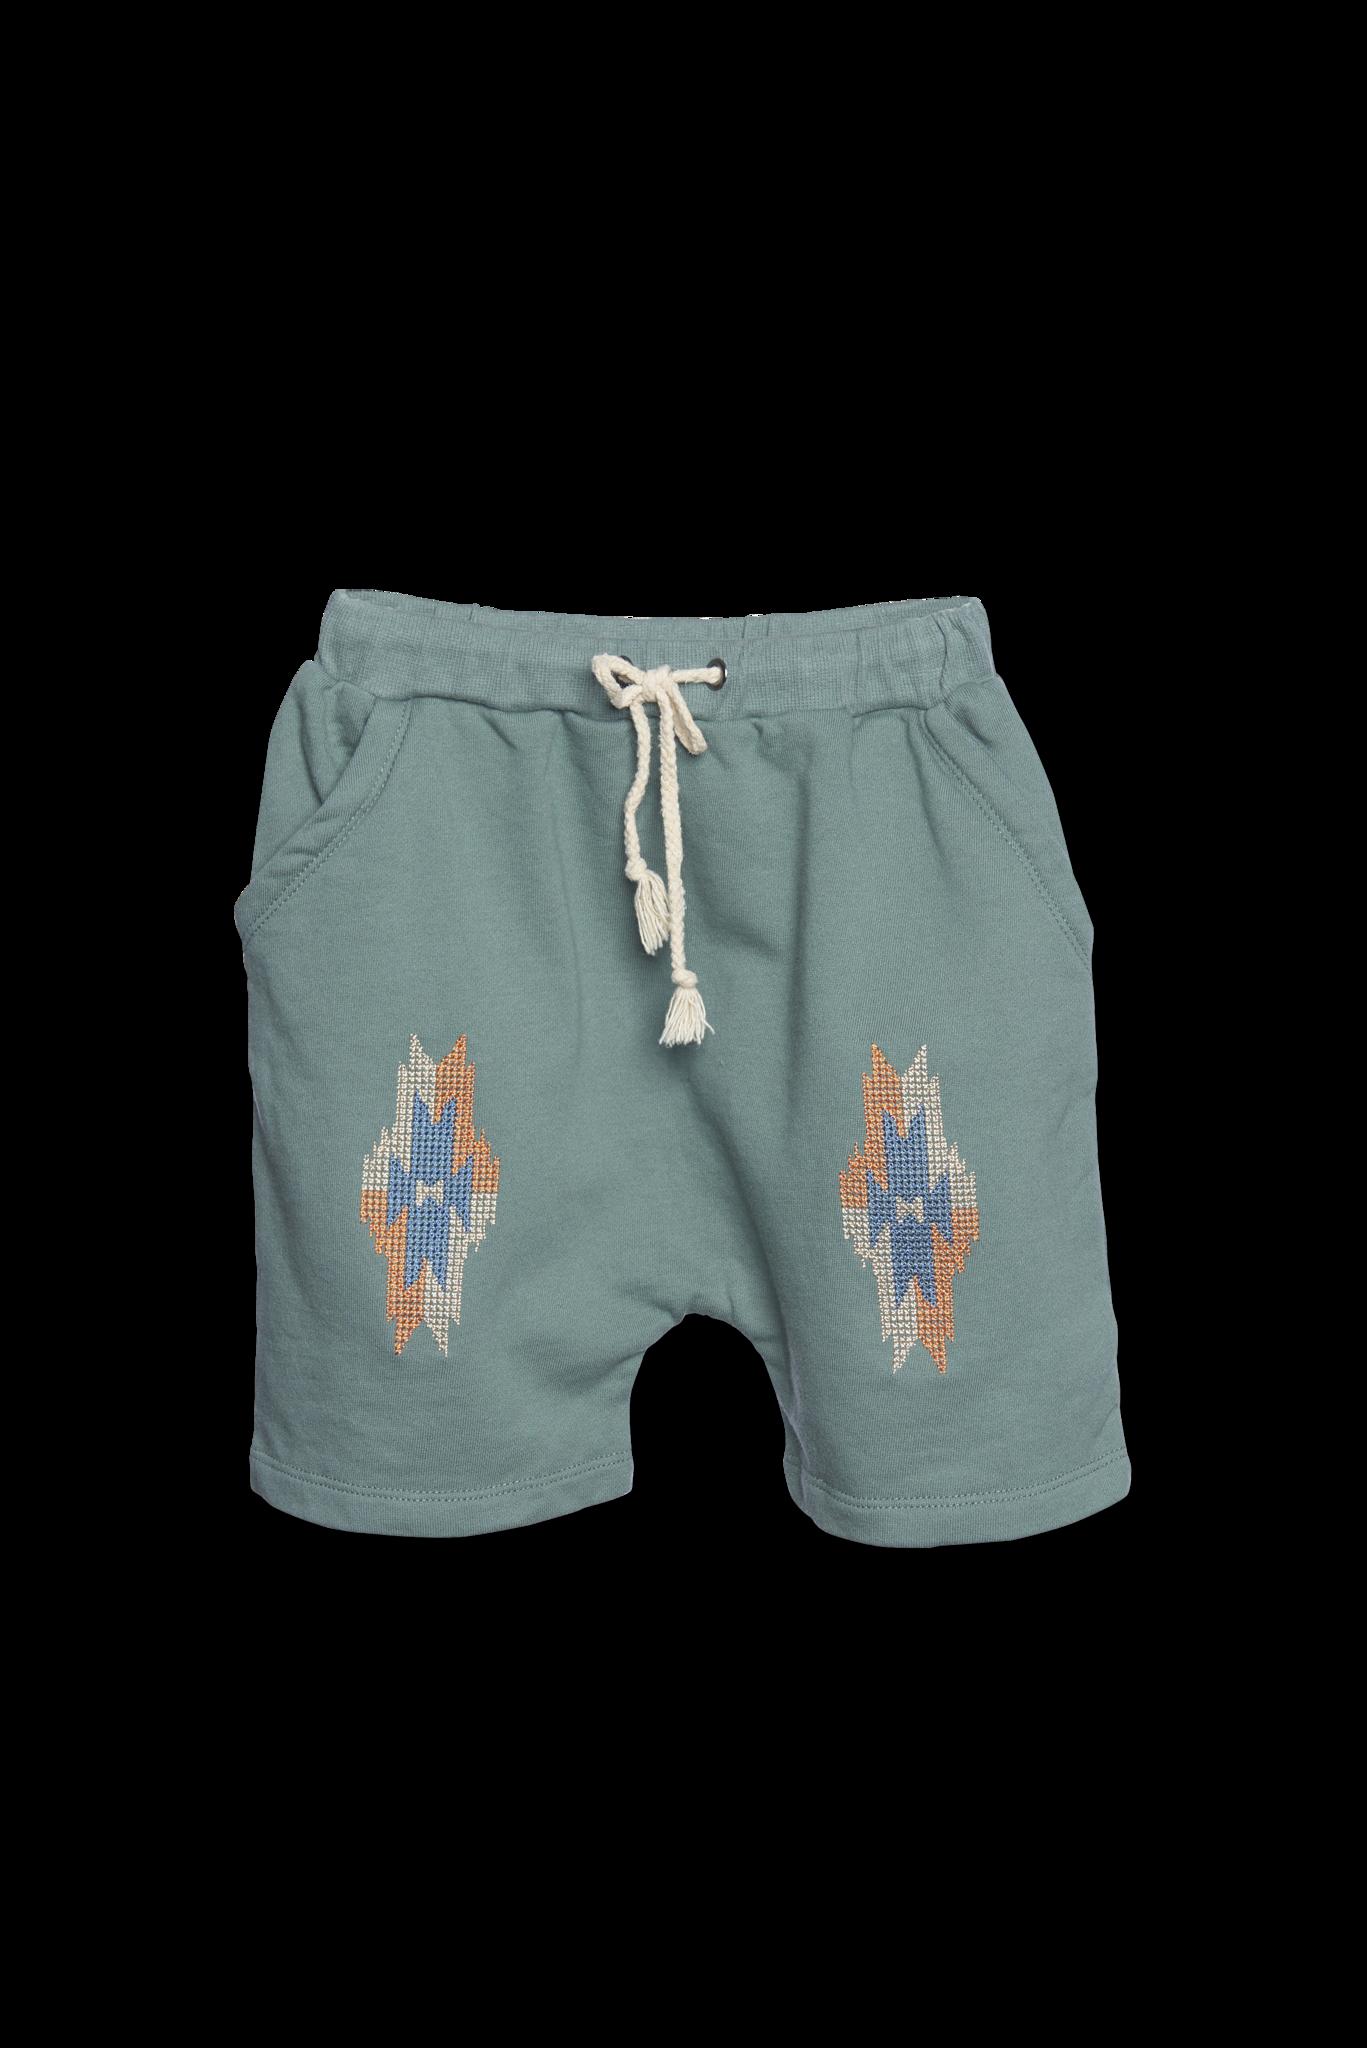 Aztec Shorts - basil-1